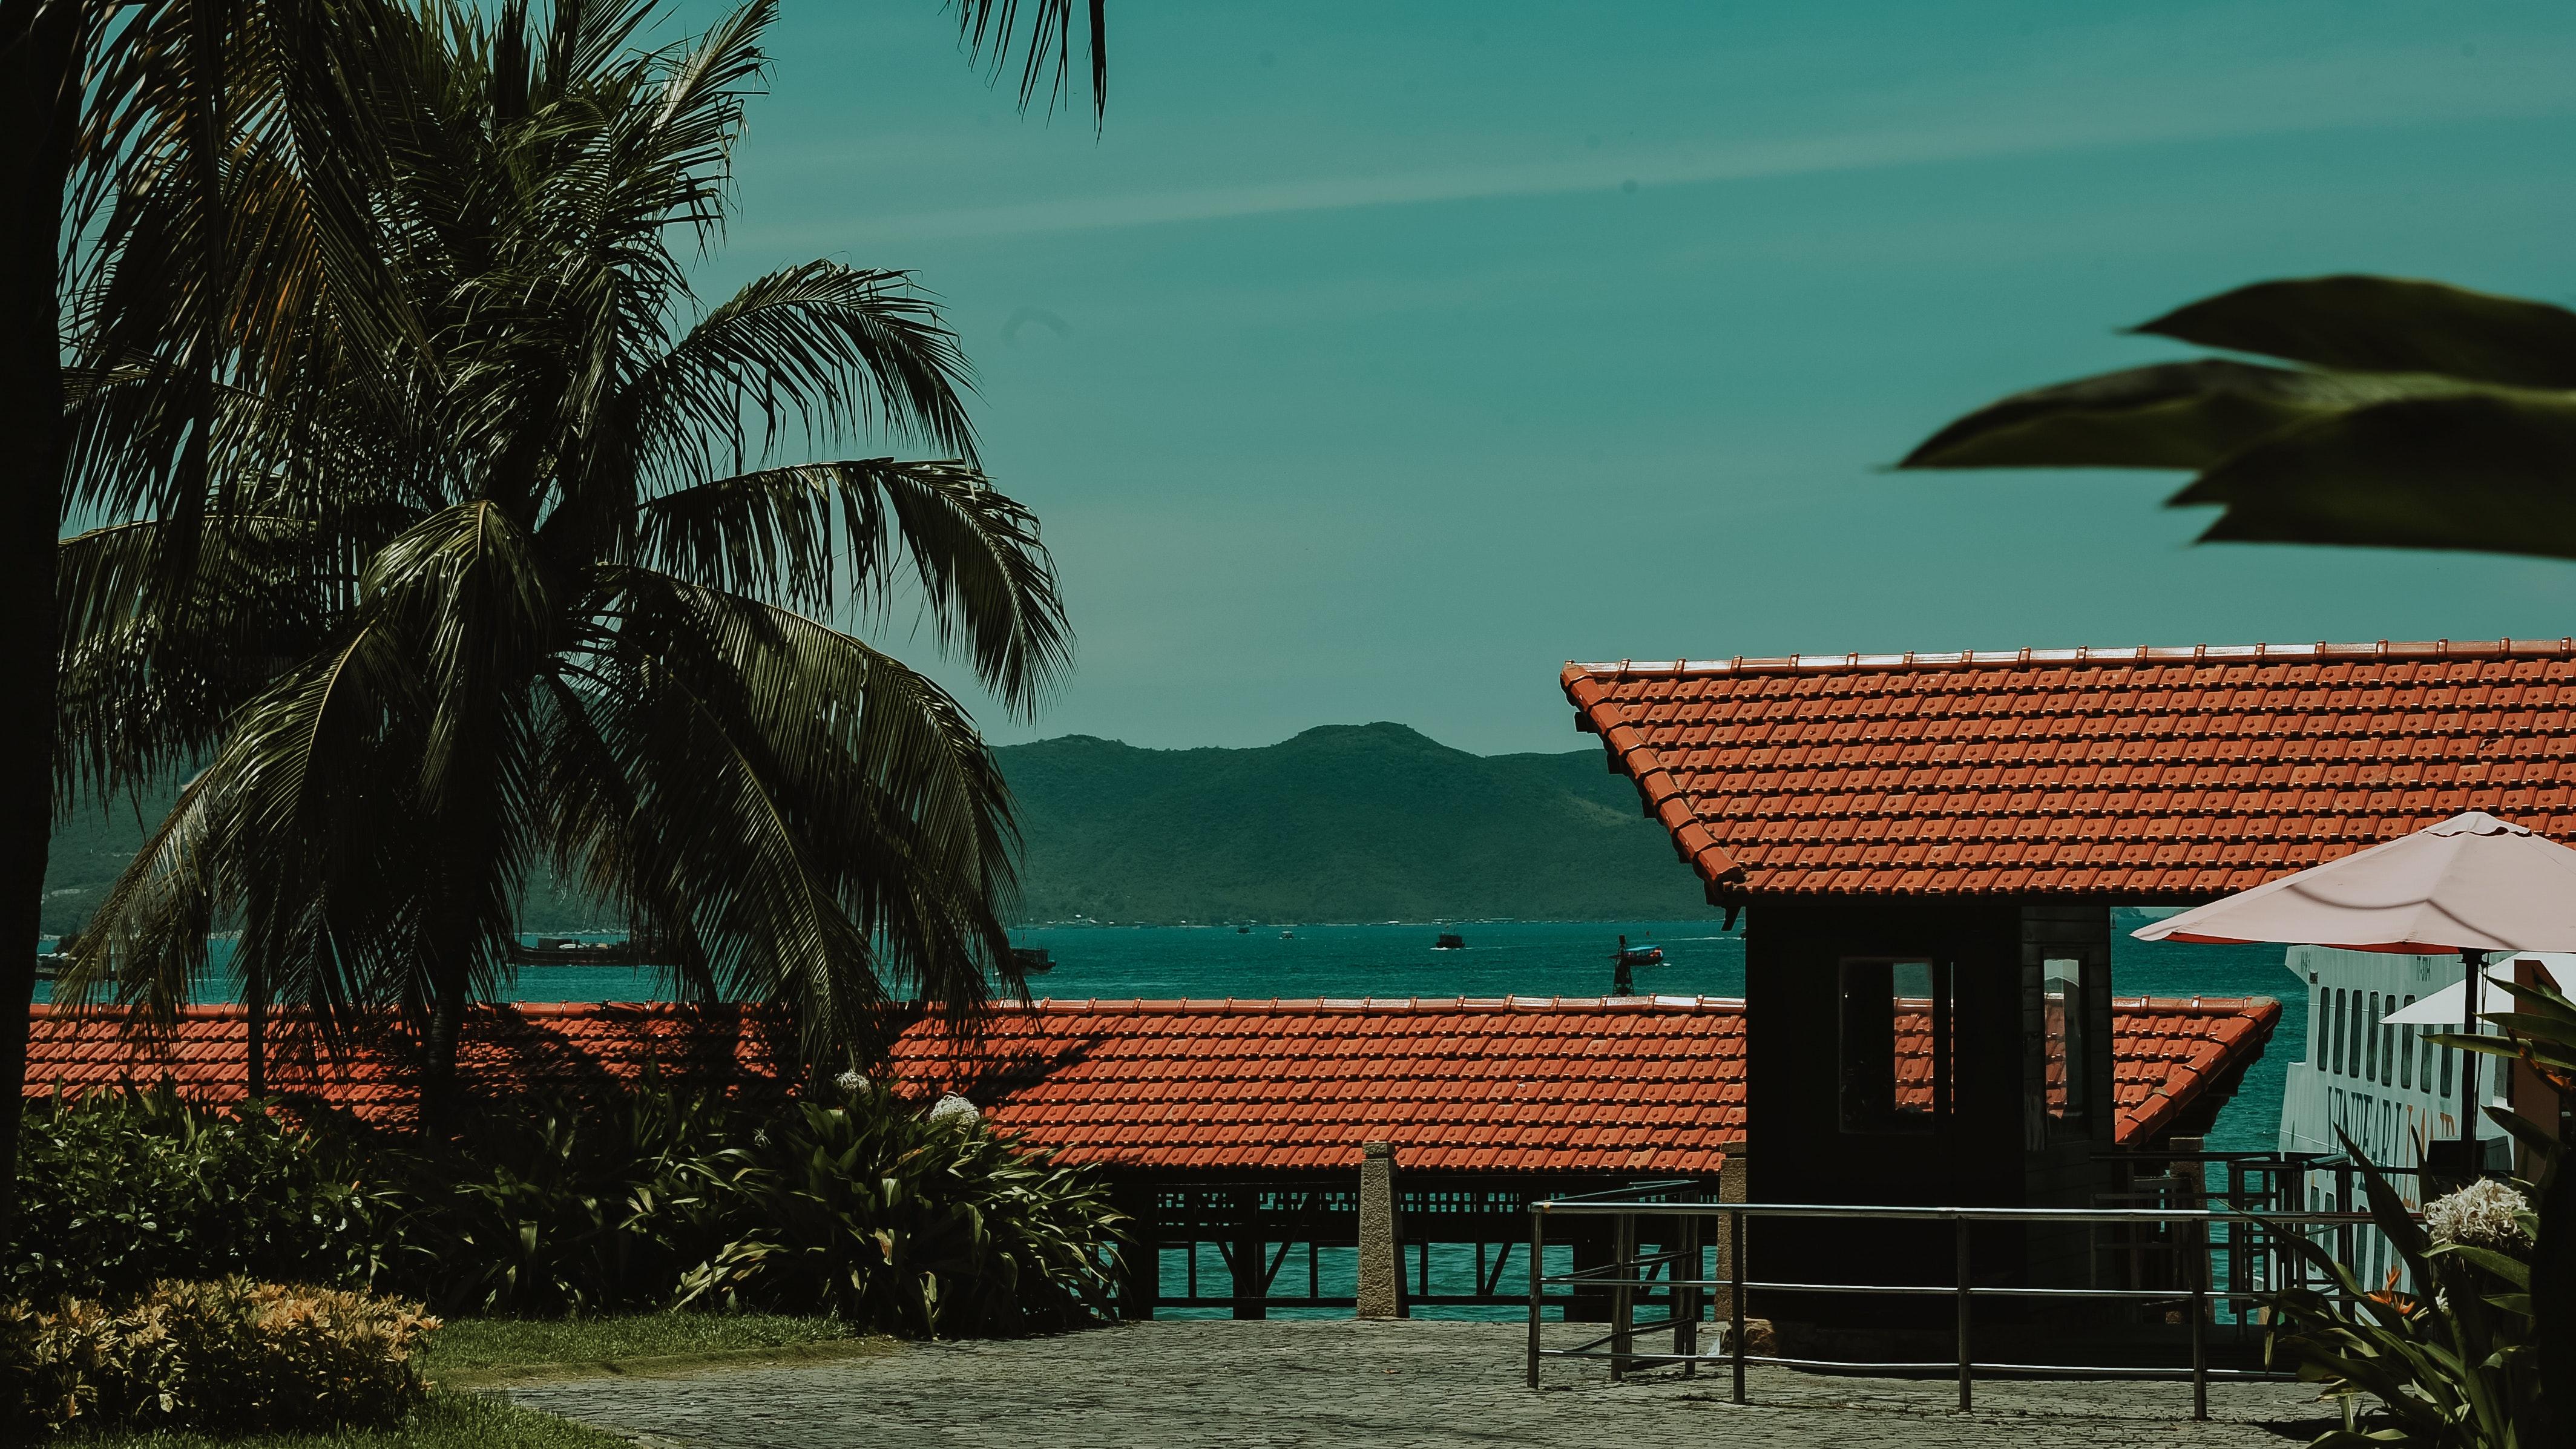 Green coconut tree near shed photo